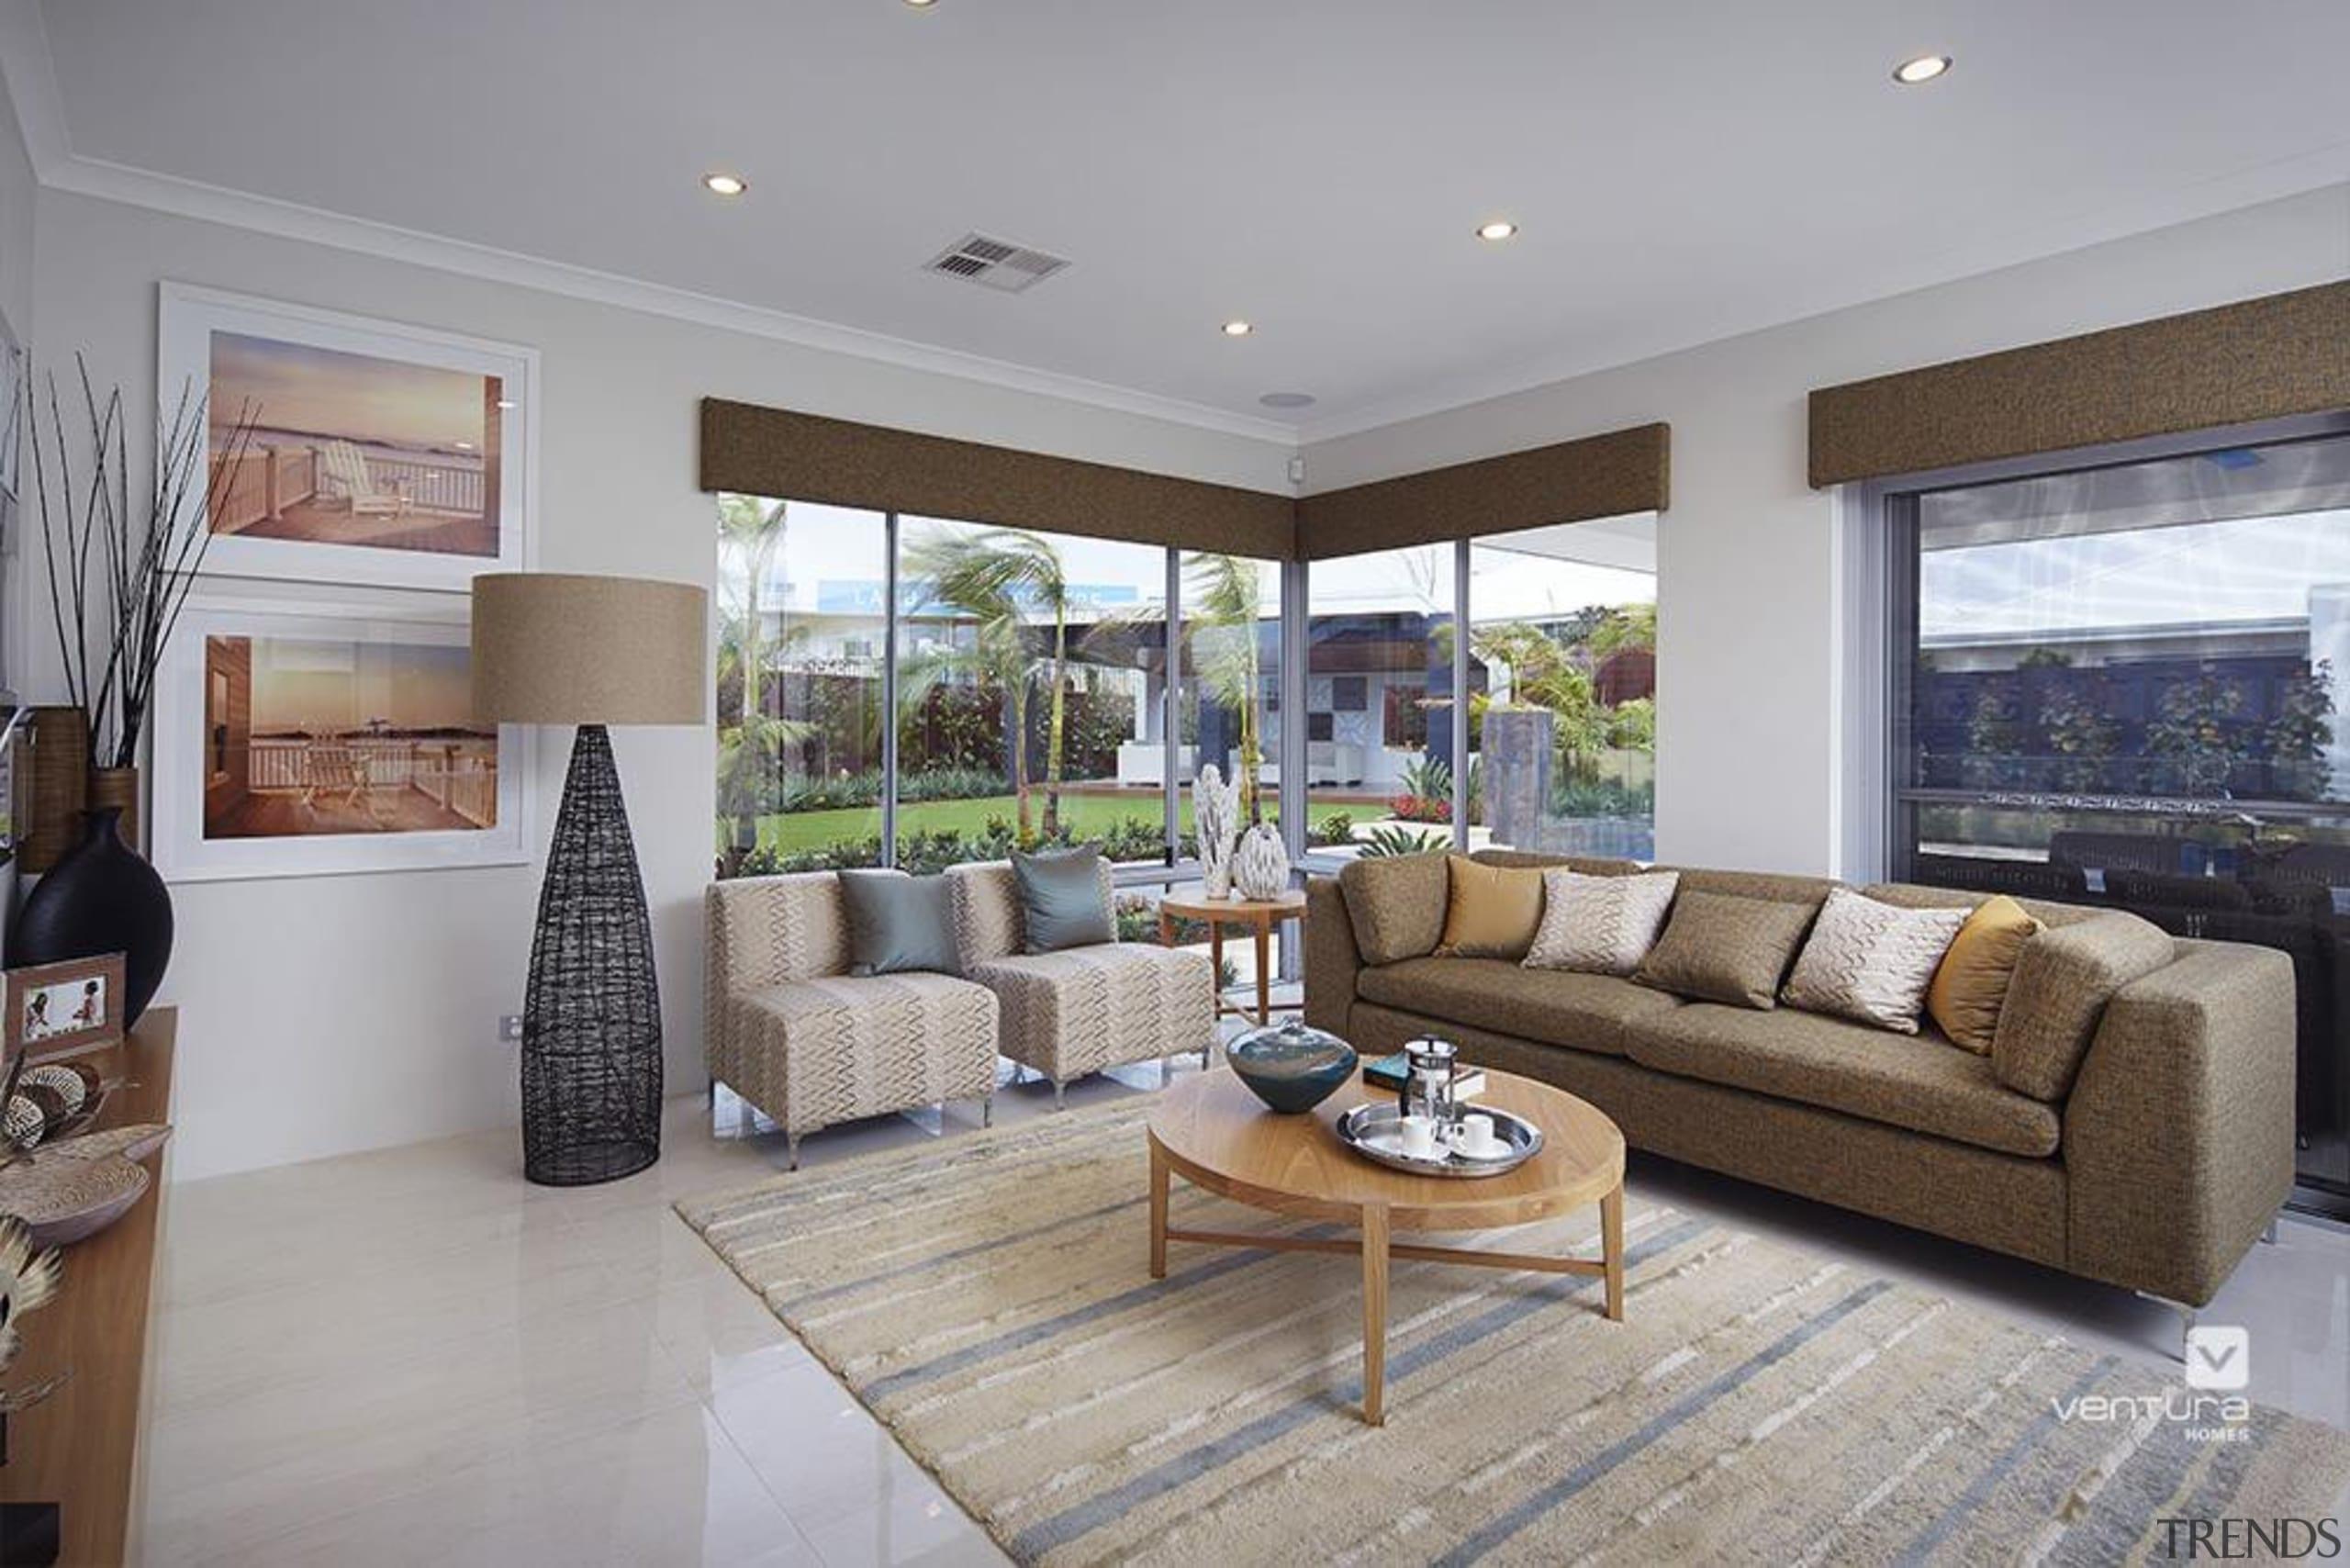 Living Room Design. - The Meridian Two Storey estate, floor, home, house, interior design, living room, property, real estate, room, window, gray